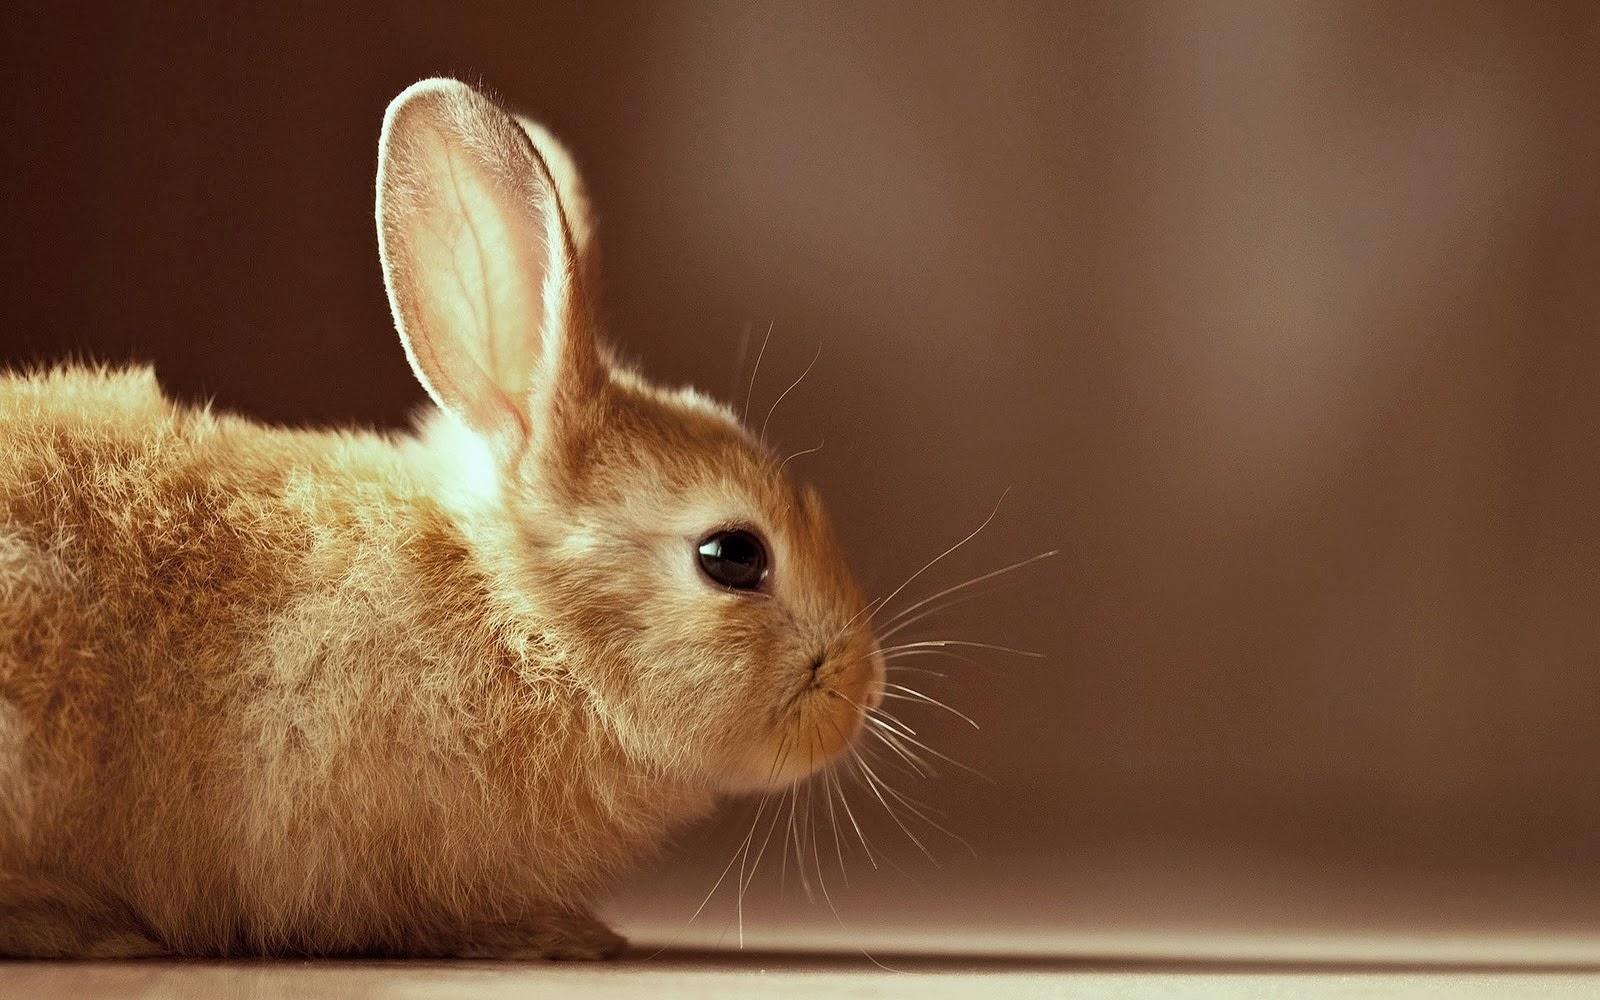 Cute Rabbits Wallpapers Hd Desktop Hd Wallpapers Free Downloads Beautiful Baby